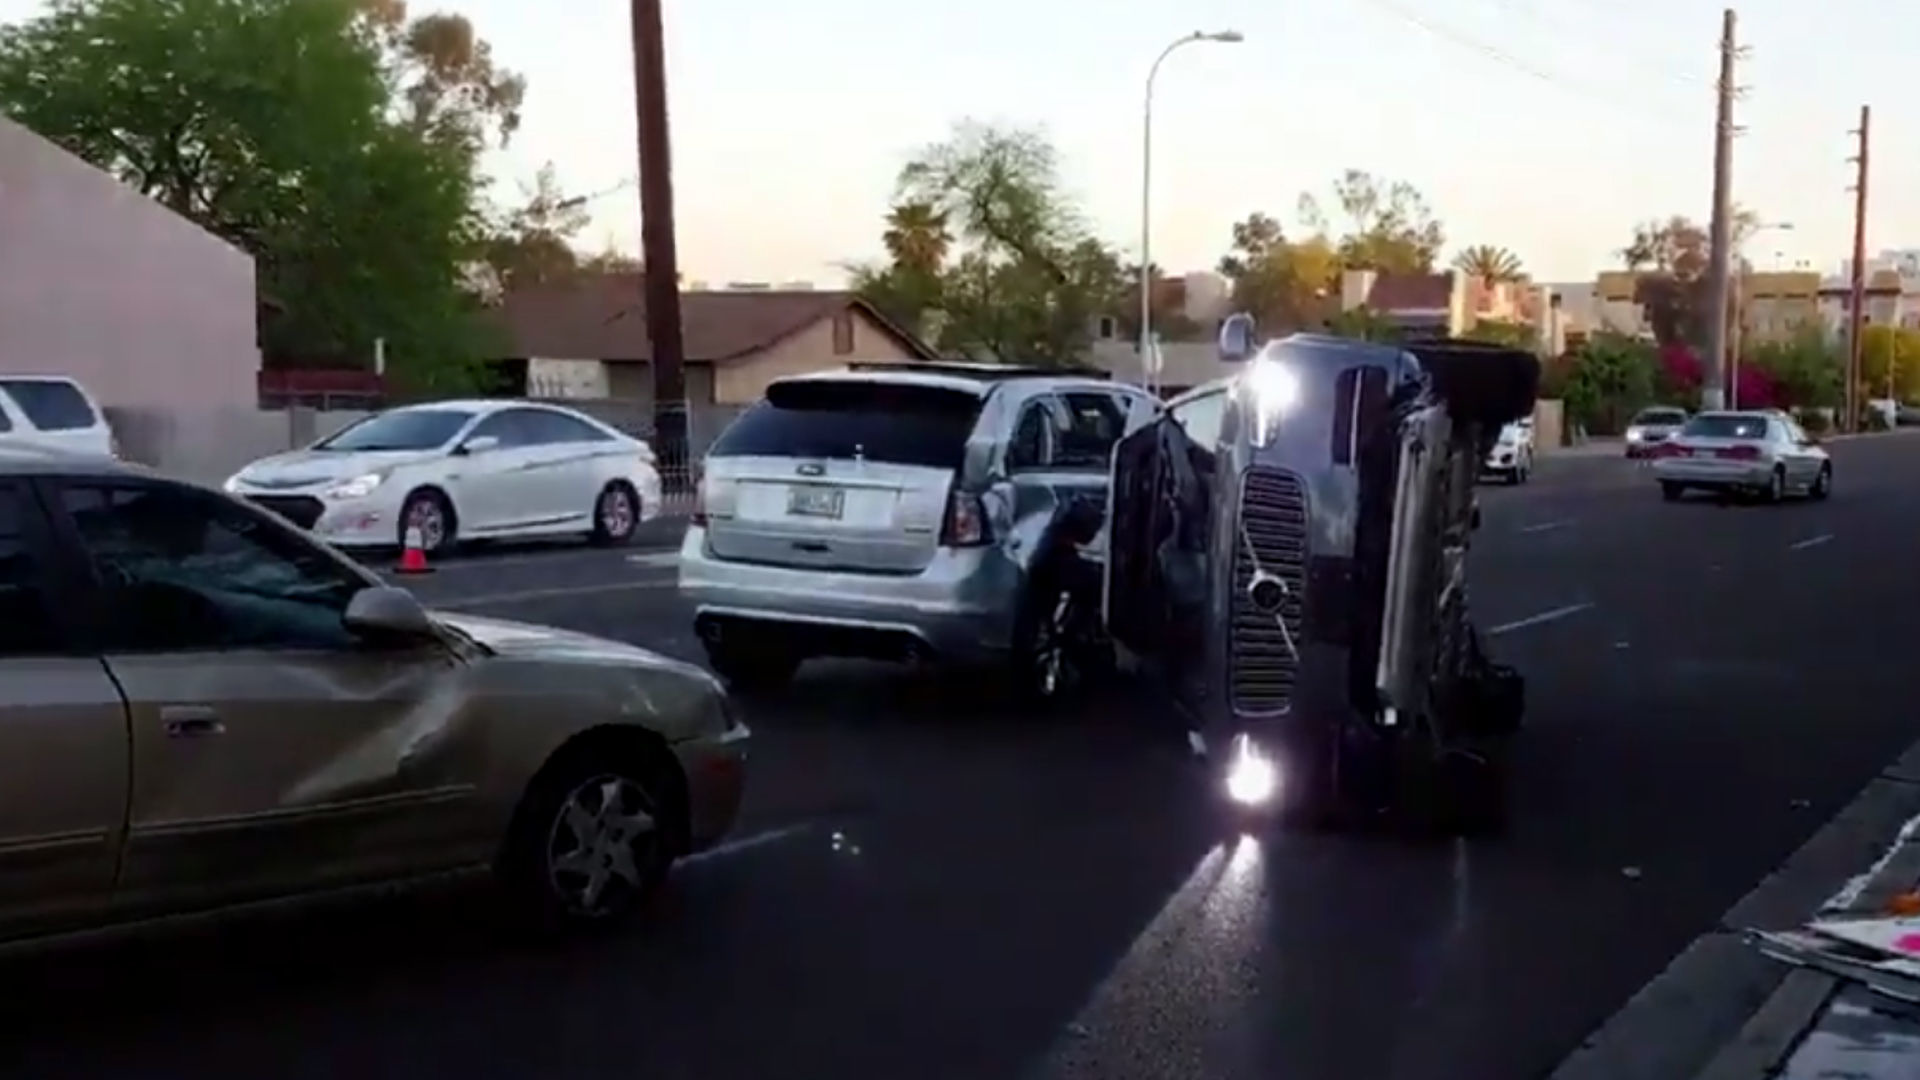 Tempe Used Cars >> Uber's Autonomous Car Crashes, Self-Driving Program Halted